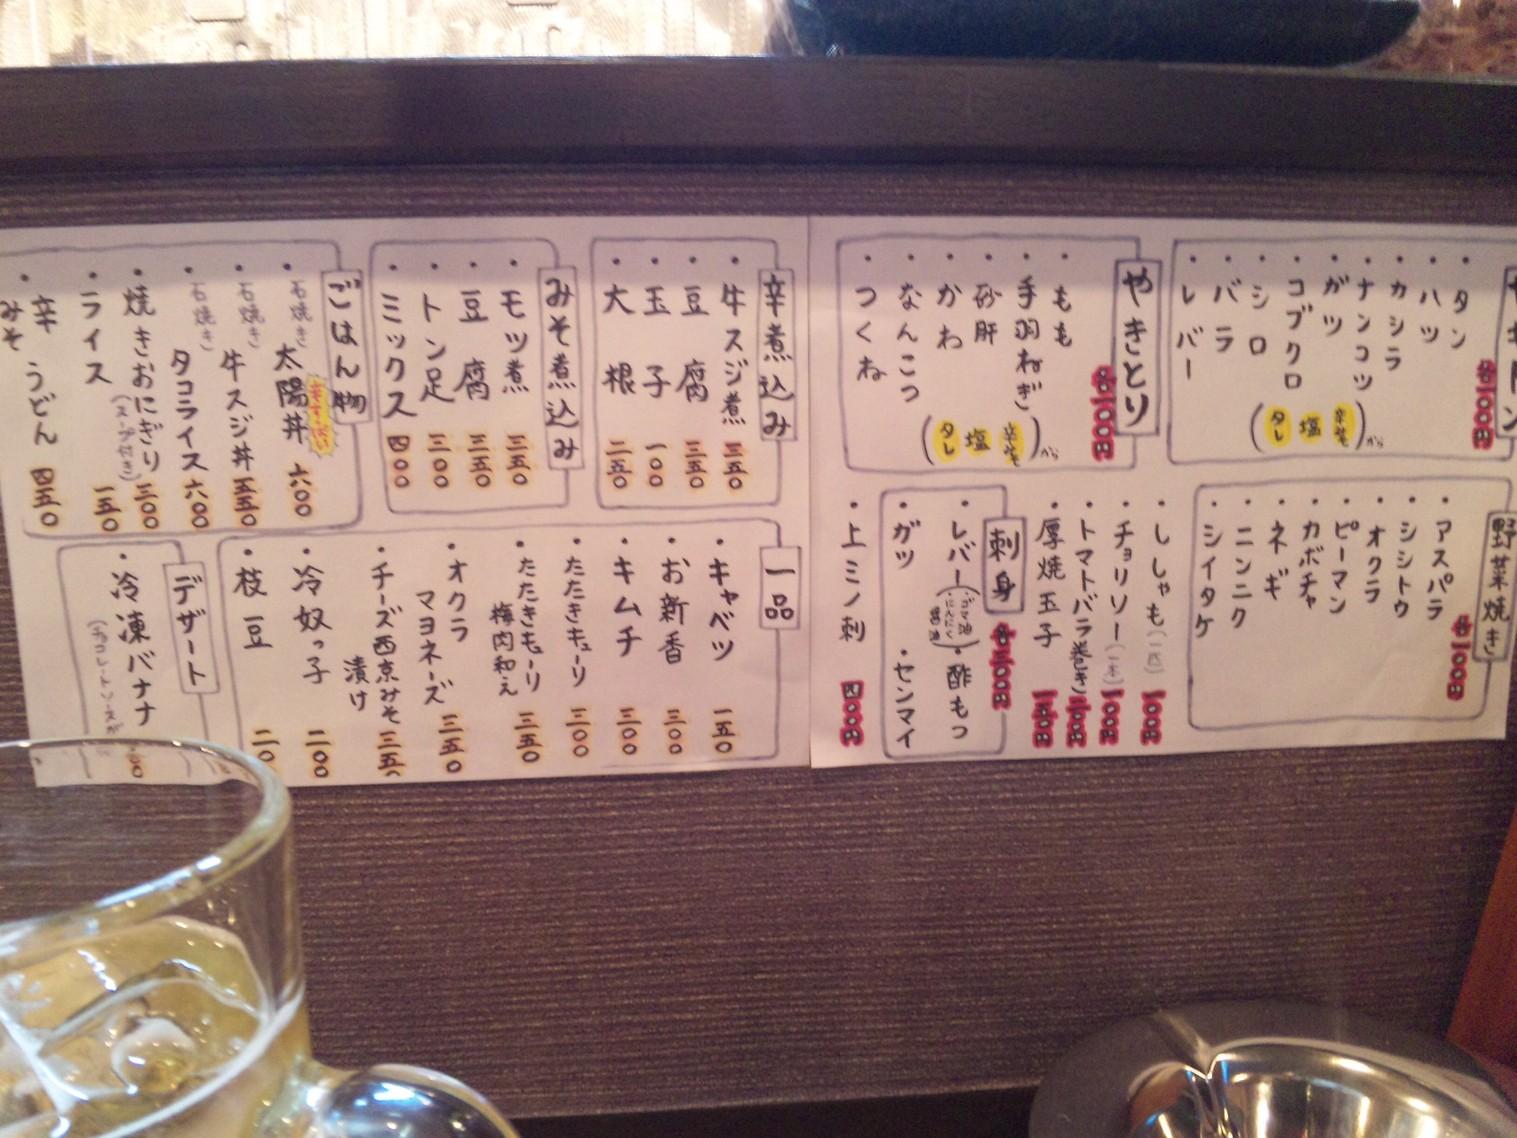 太陽食堂 幡ヶ谷店